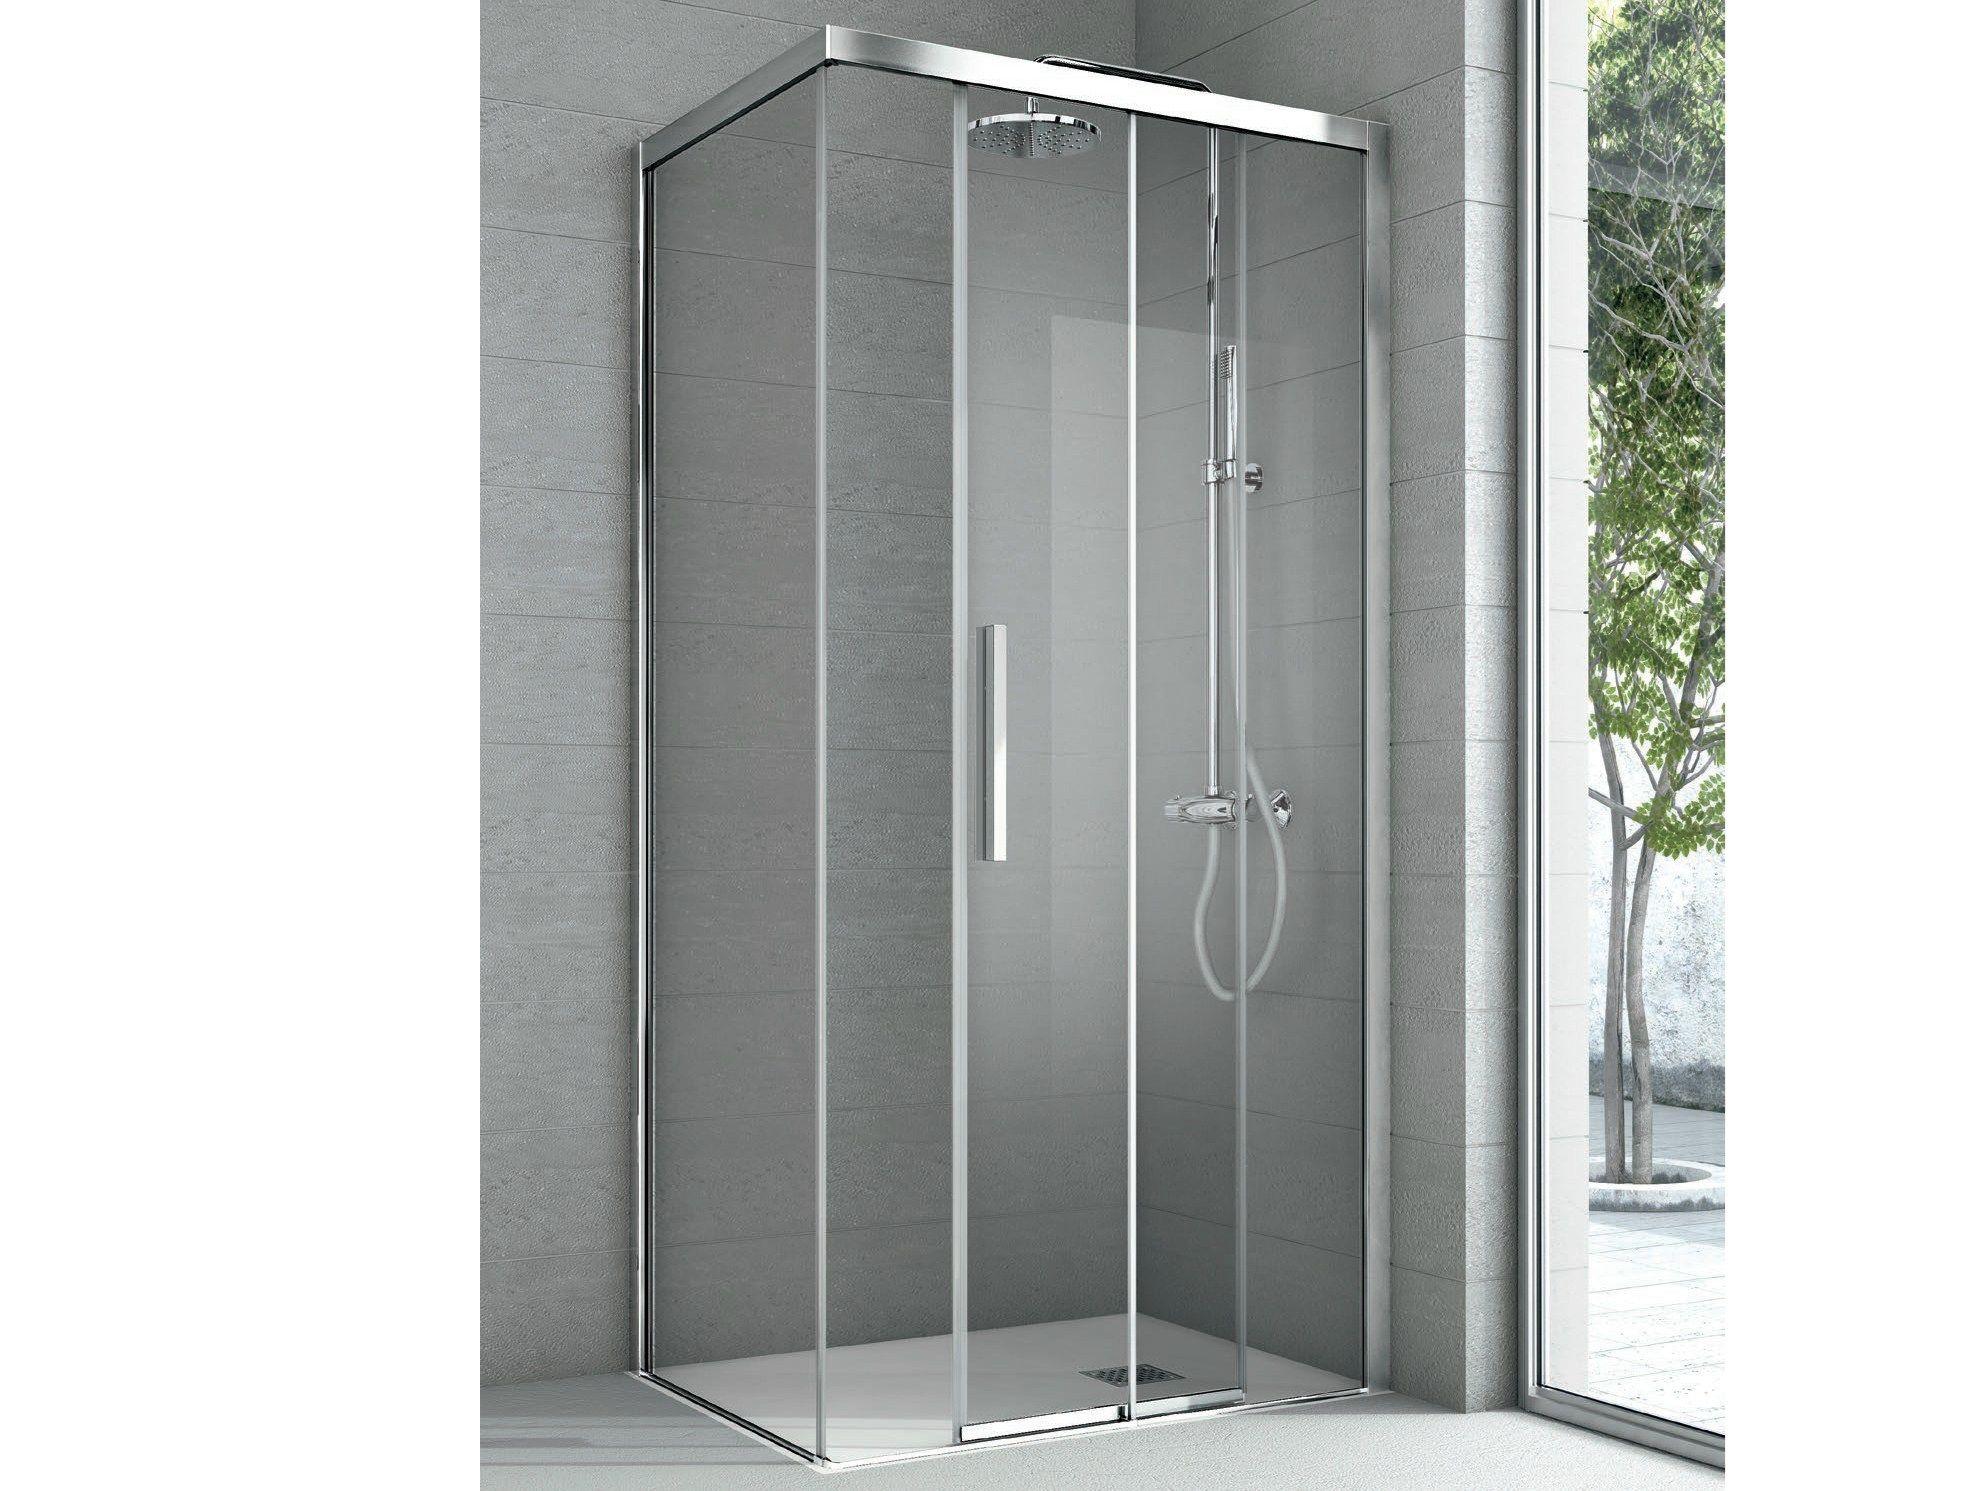 Cabinas de ducha rectangulares baratas for Cabina de ducha easy